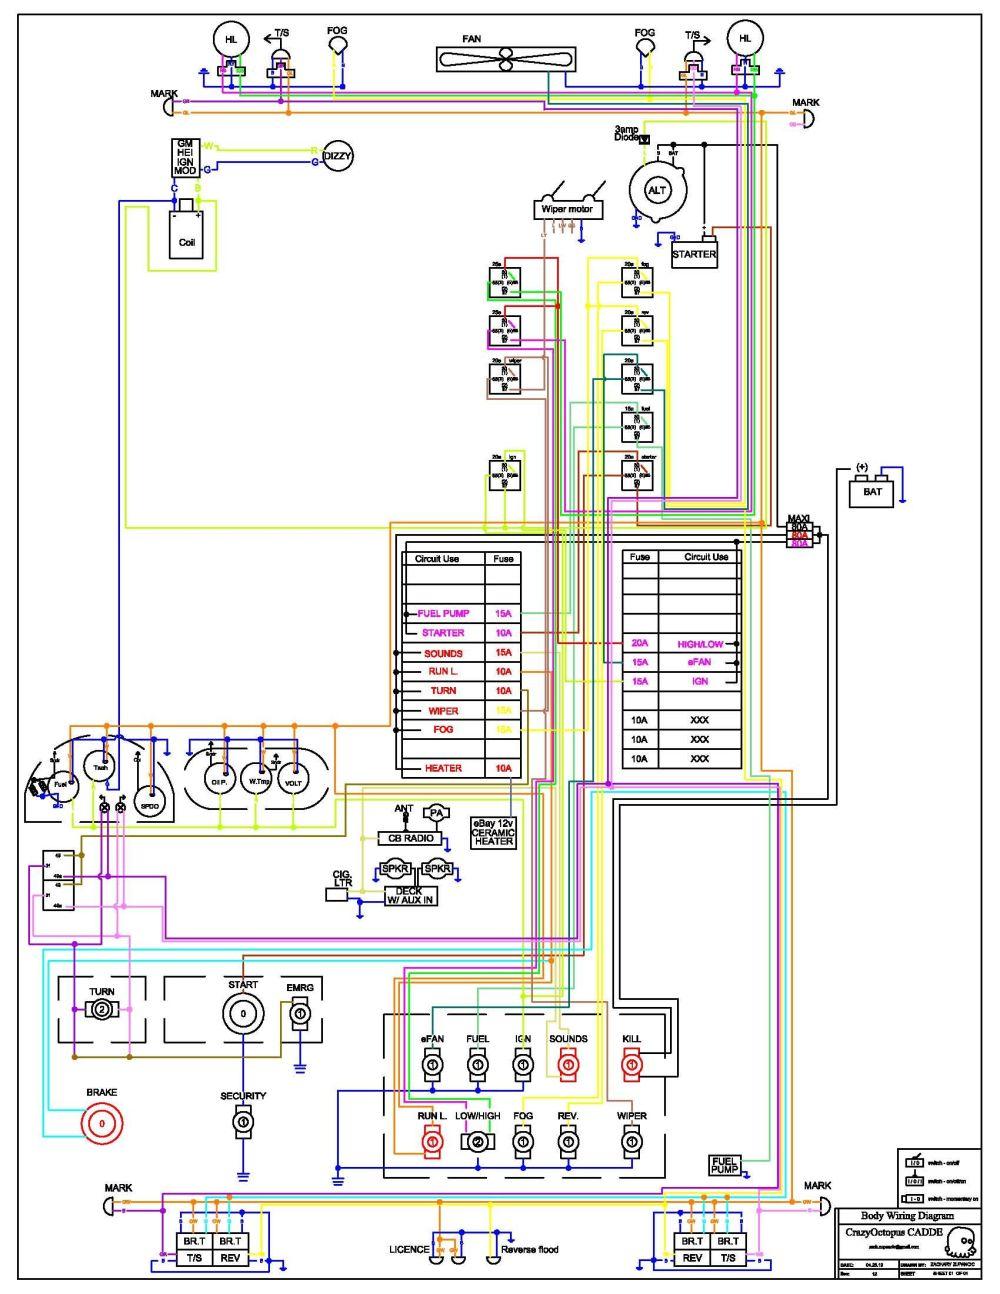 medium resolution of  f0a9ebc3a4a2529096f135d5fec5faaa race car wiring diagrams diagram pinterest cars racing mower wiring diagram at cita asia